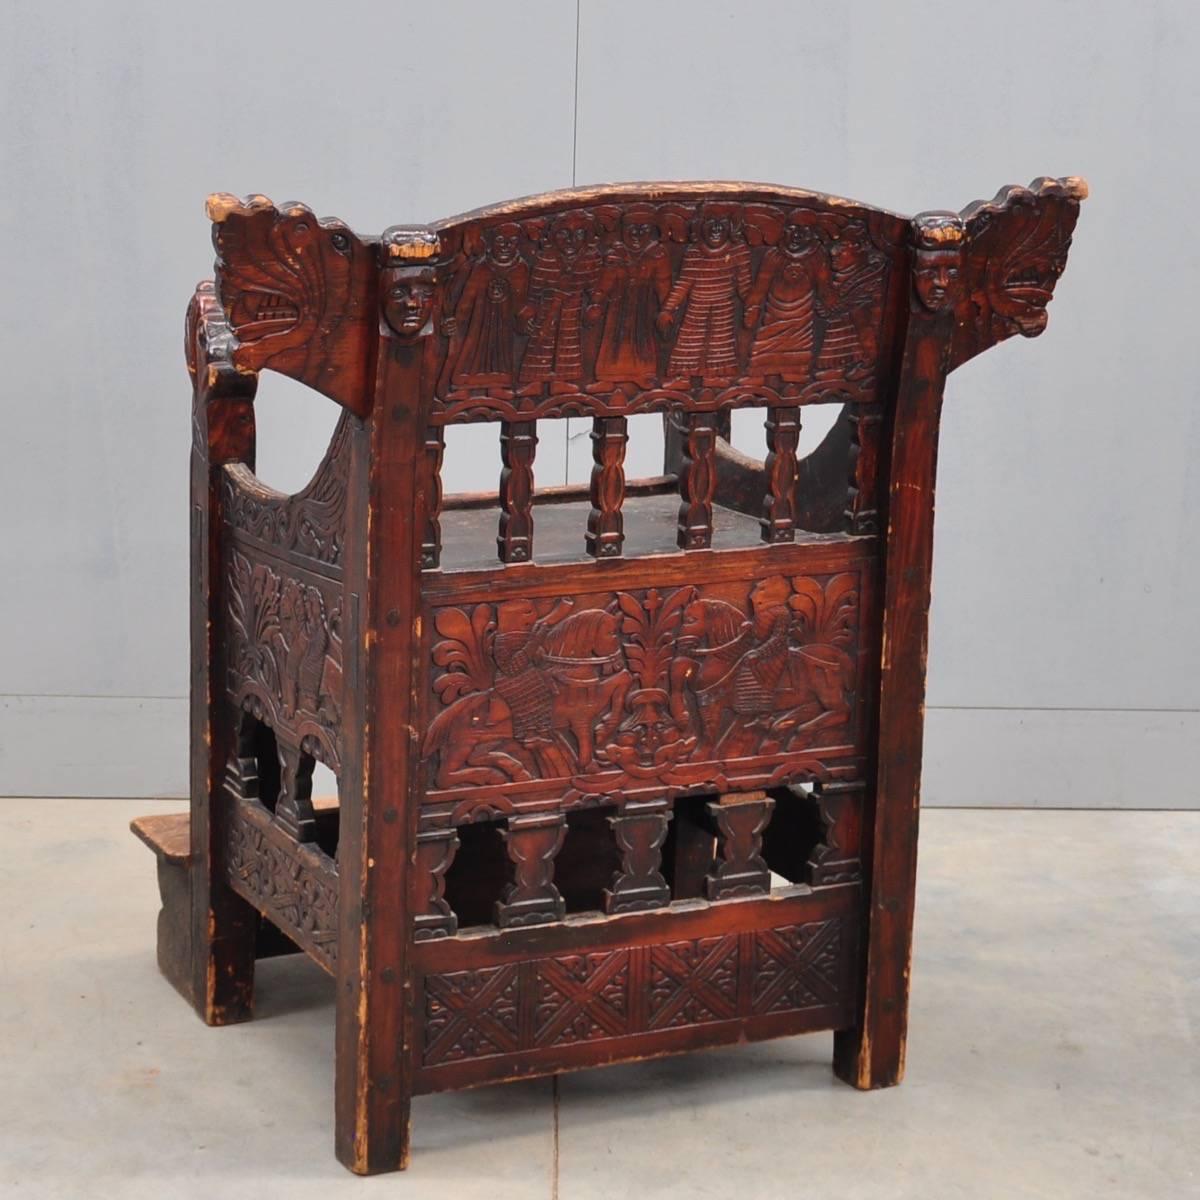 Swedish Carved Throne De Grande Antique Furniture